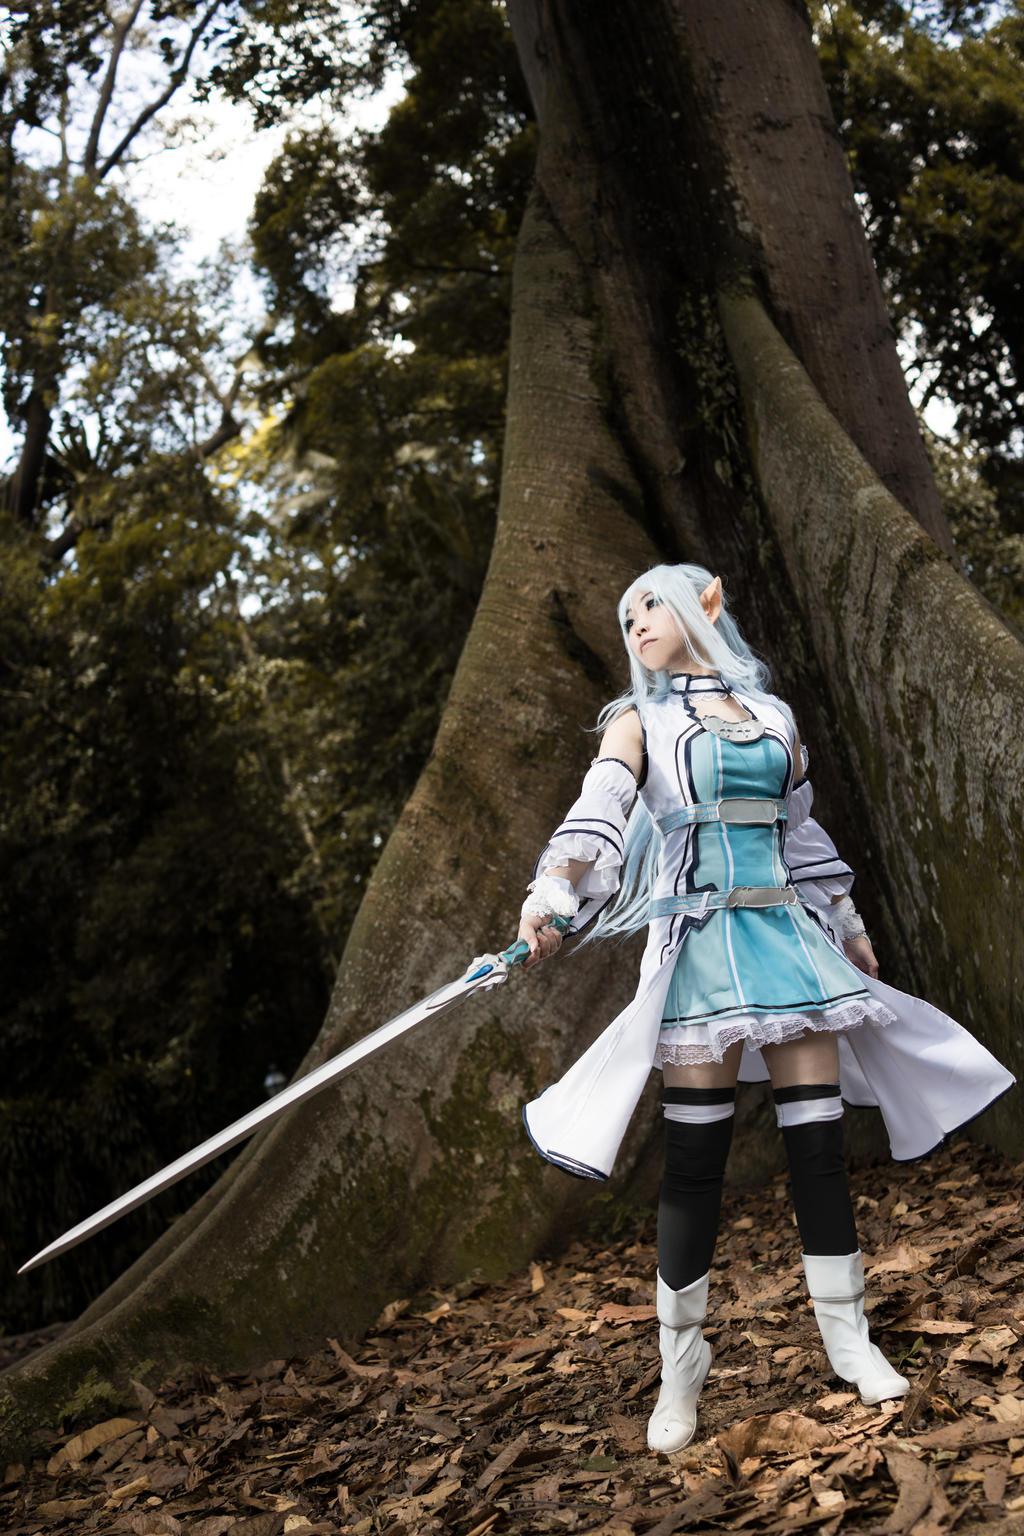 Warrior Maiden: Asuna by zerartul